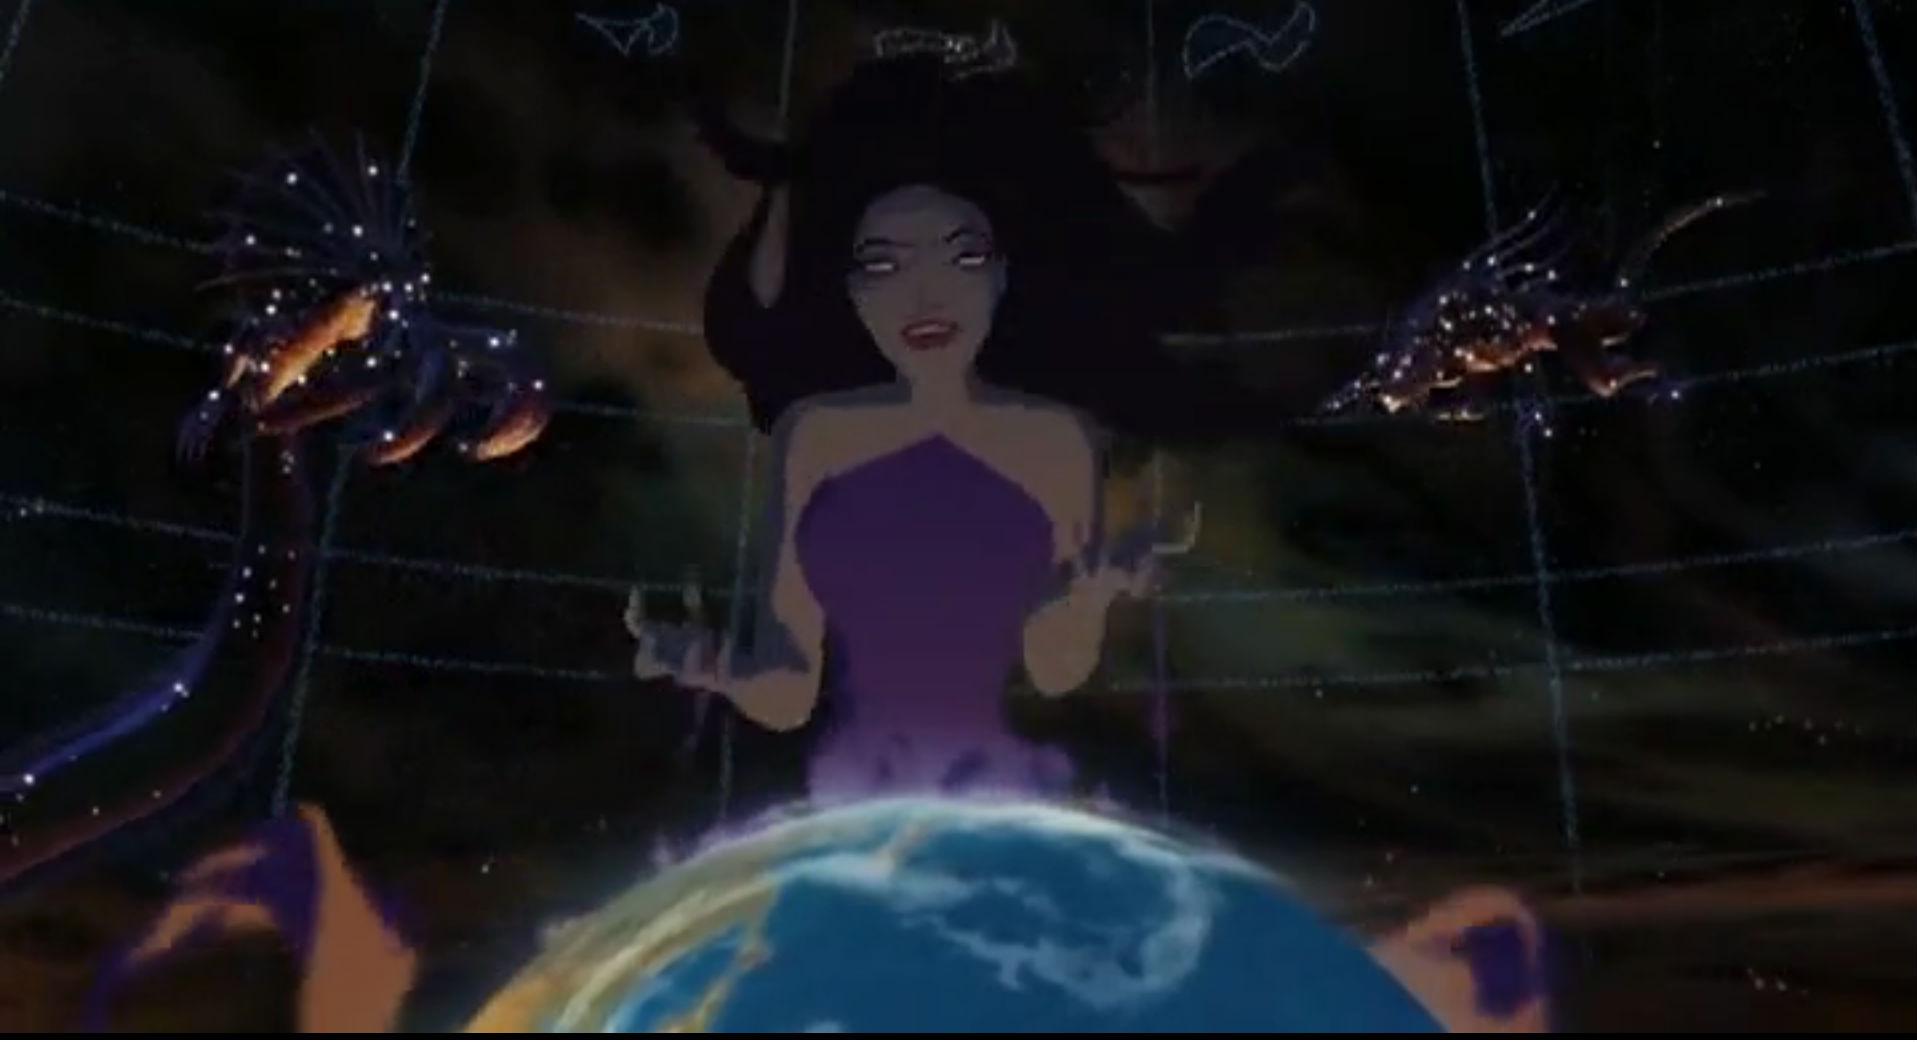 Смотреть онлайн Мультик Синдбад: Легенда семи морей / Sinbad: Legend of the Seven Seas Семейный